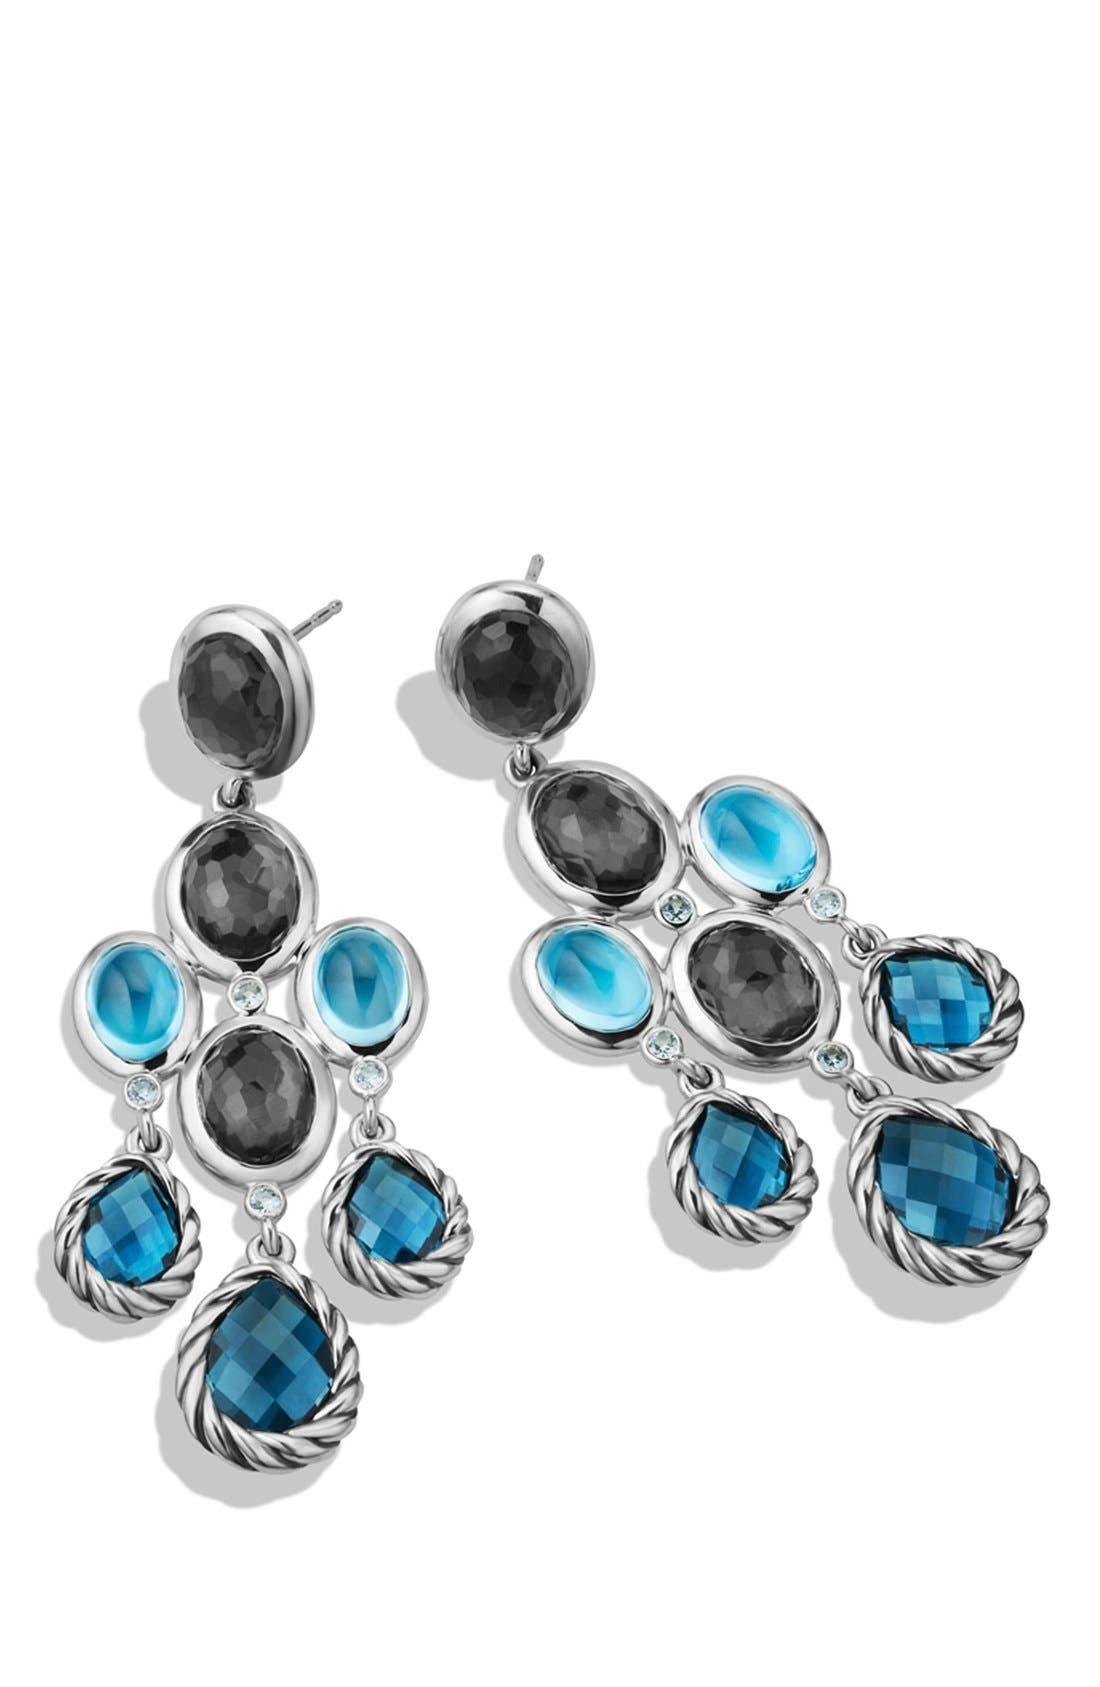 Alternate Image 2  - David Yurman 'Mosaic - Color Classic' Chandelier Earrings with Hampton Blue Topaz, Black Orchid & Gray Sapphires